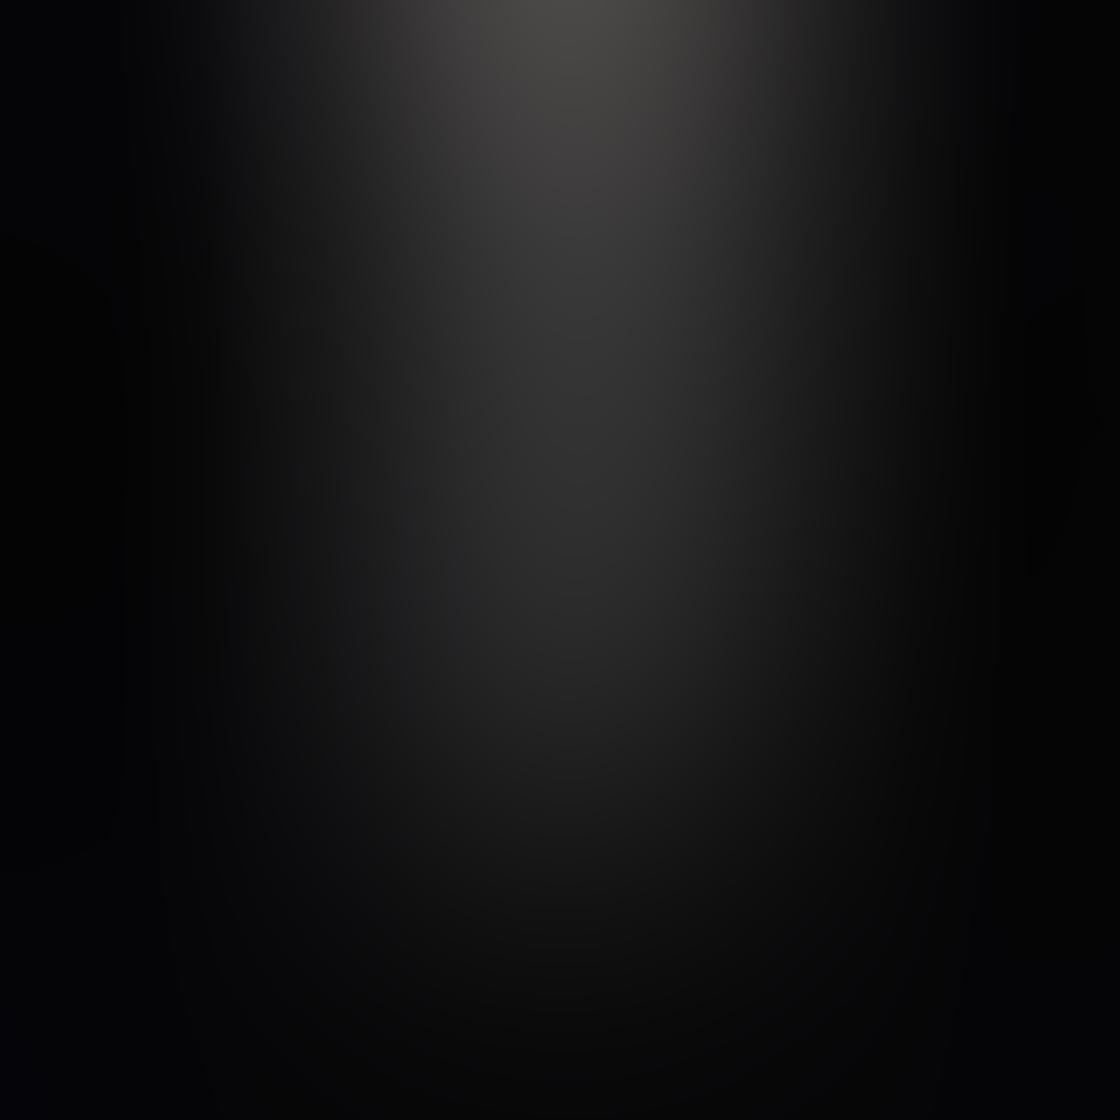 Shadow iPhone Photos 29